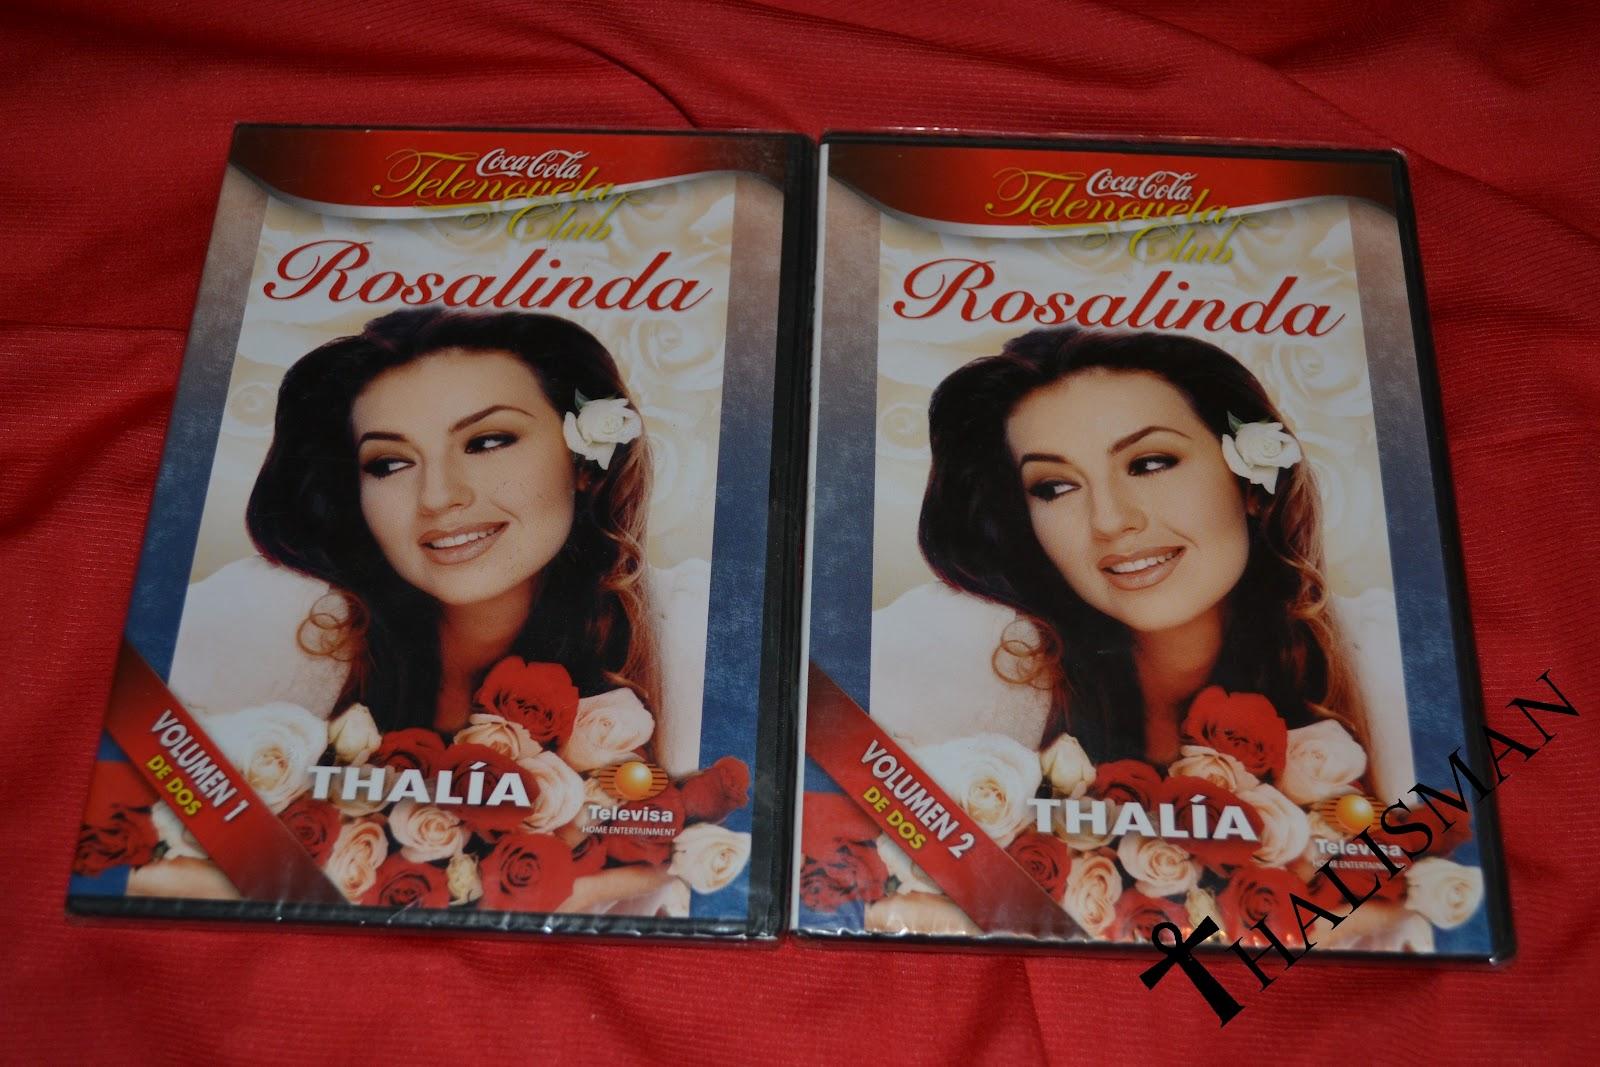 Amazon.com: Rosalinda: Thalía, Fernando Carrillo, Angélica María ...